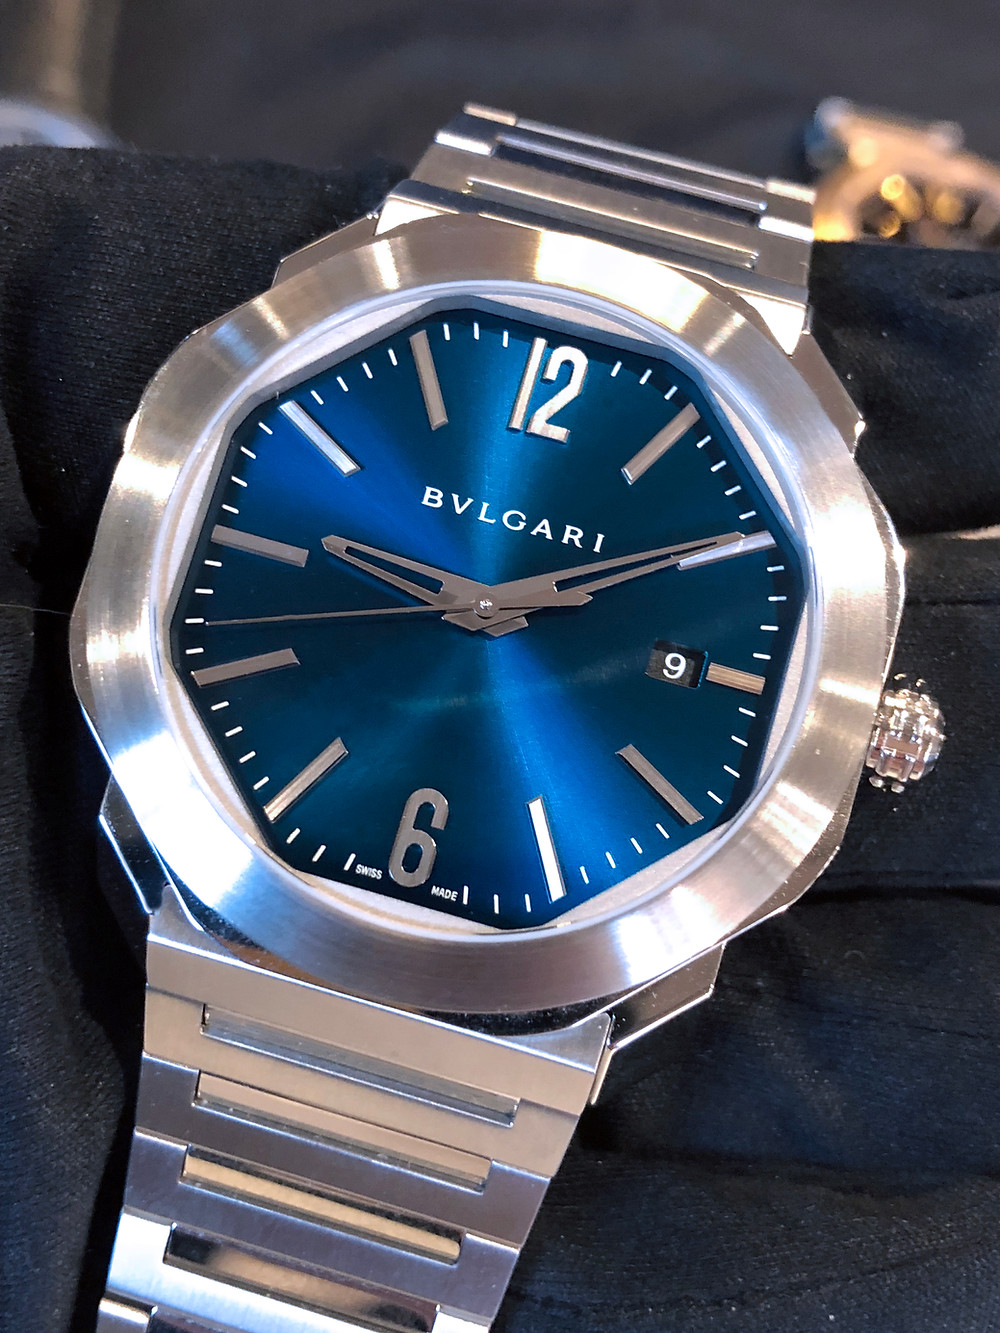 OCTO ROMA 腕錶 41毫米直徑精鋼或精鋼與18k玫瑰金錶殼(視乎型號而定)/小時、分鐘與秒指示/BVLGARI自製Calibre BVL 191 Solotempo型號自動上鍊機芯,42小時動力儲存。